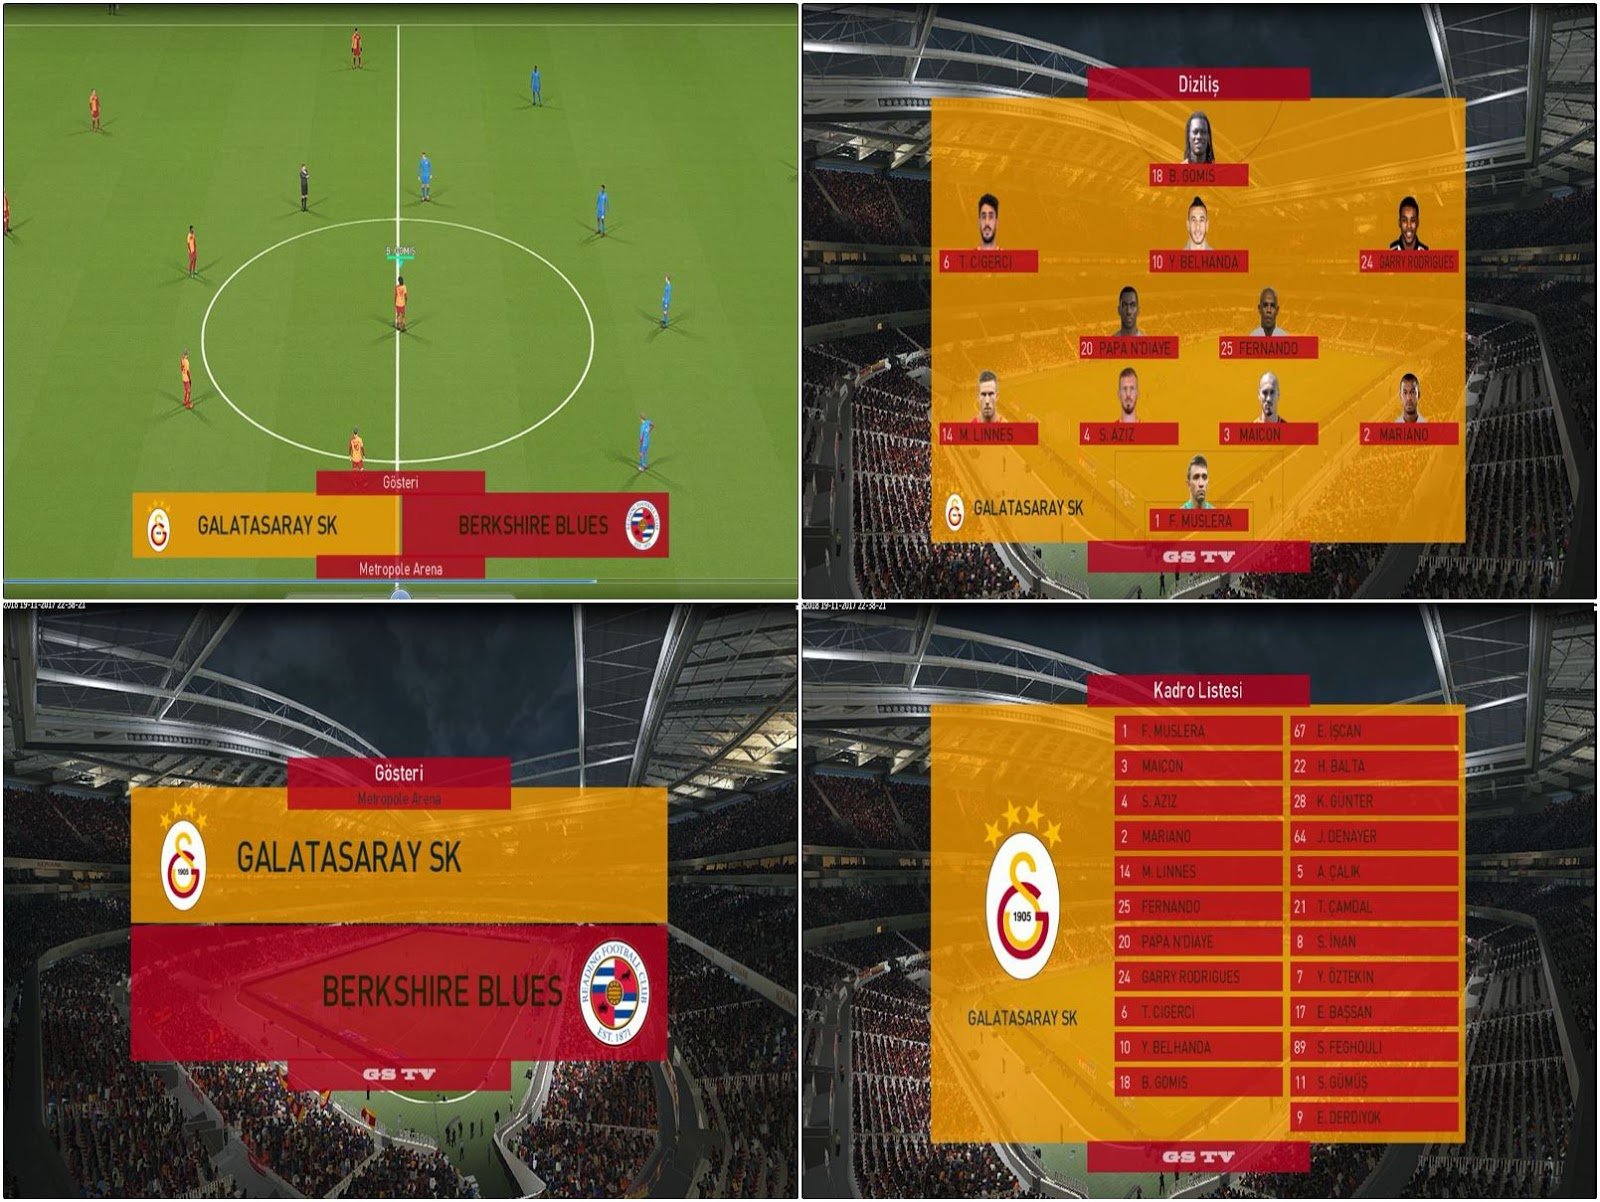 PES 2018 Galatasaray Scoreboard by 44maestro